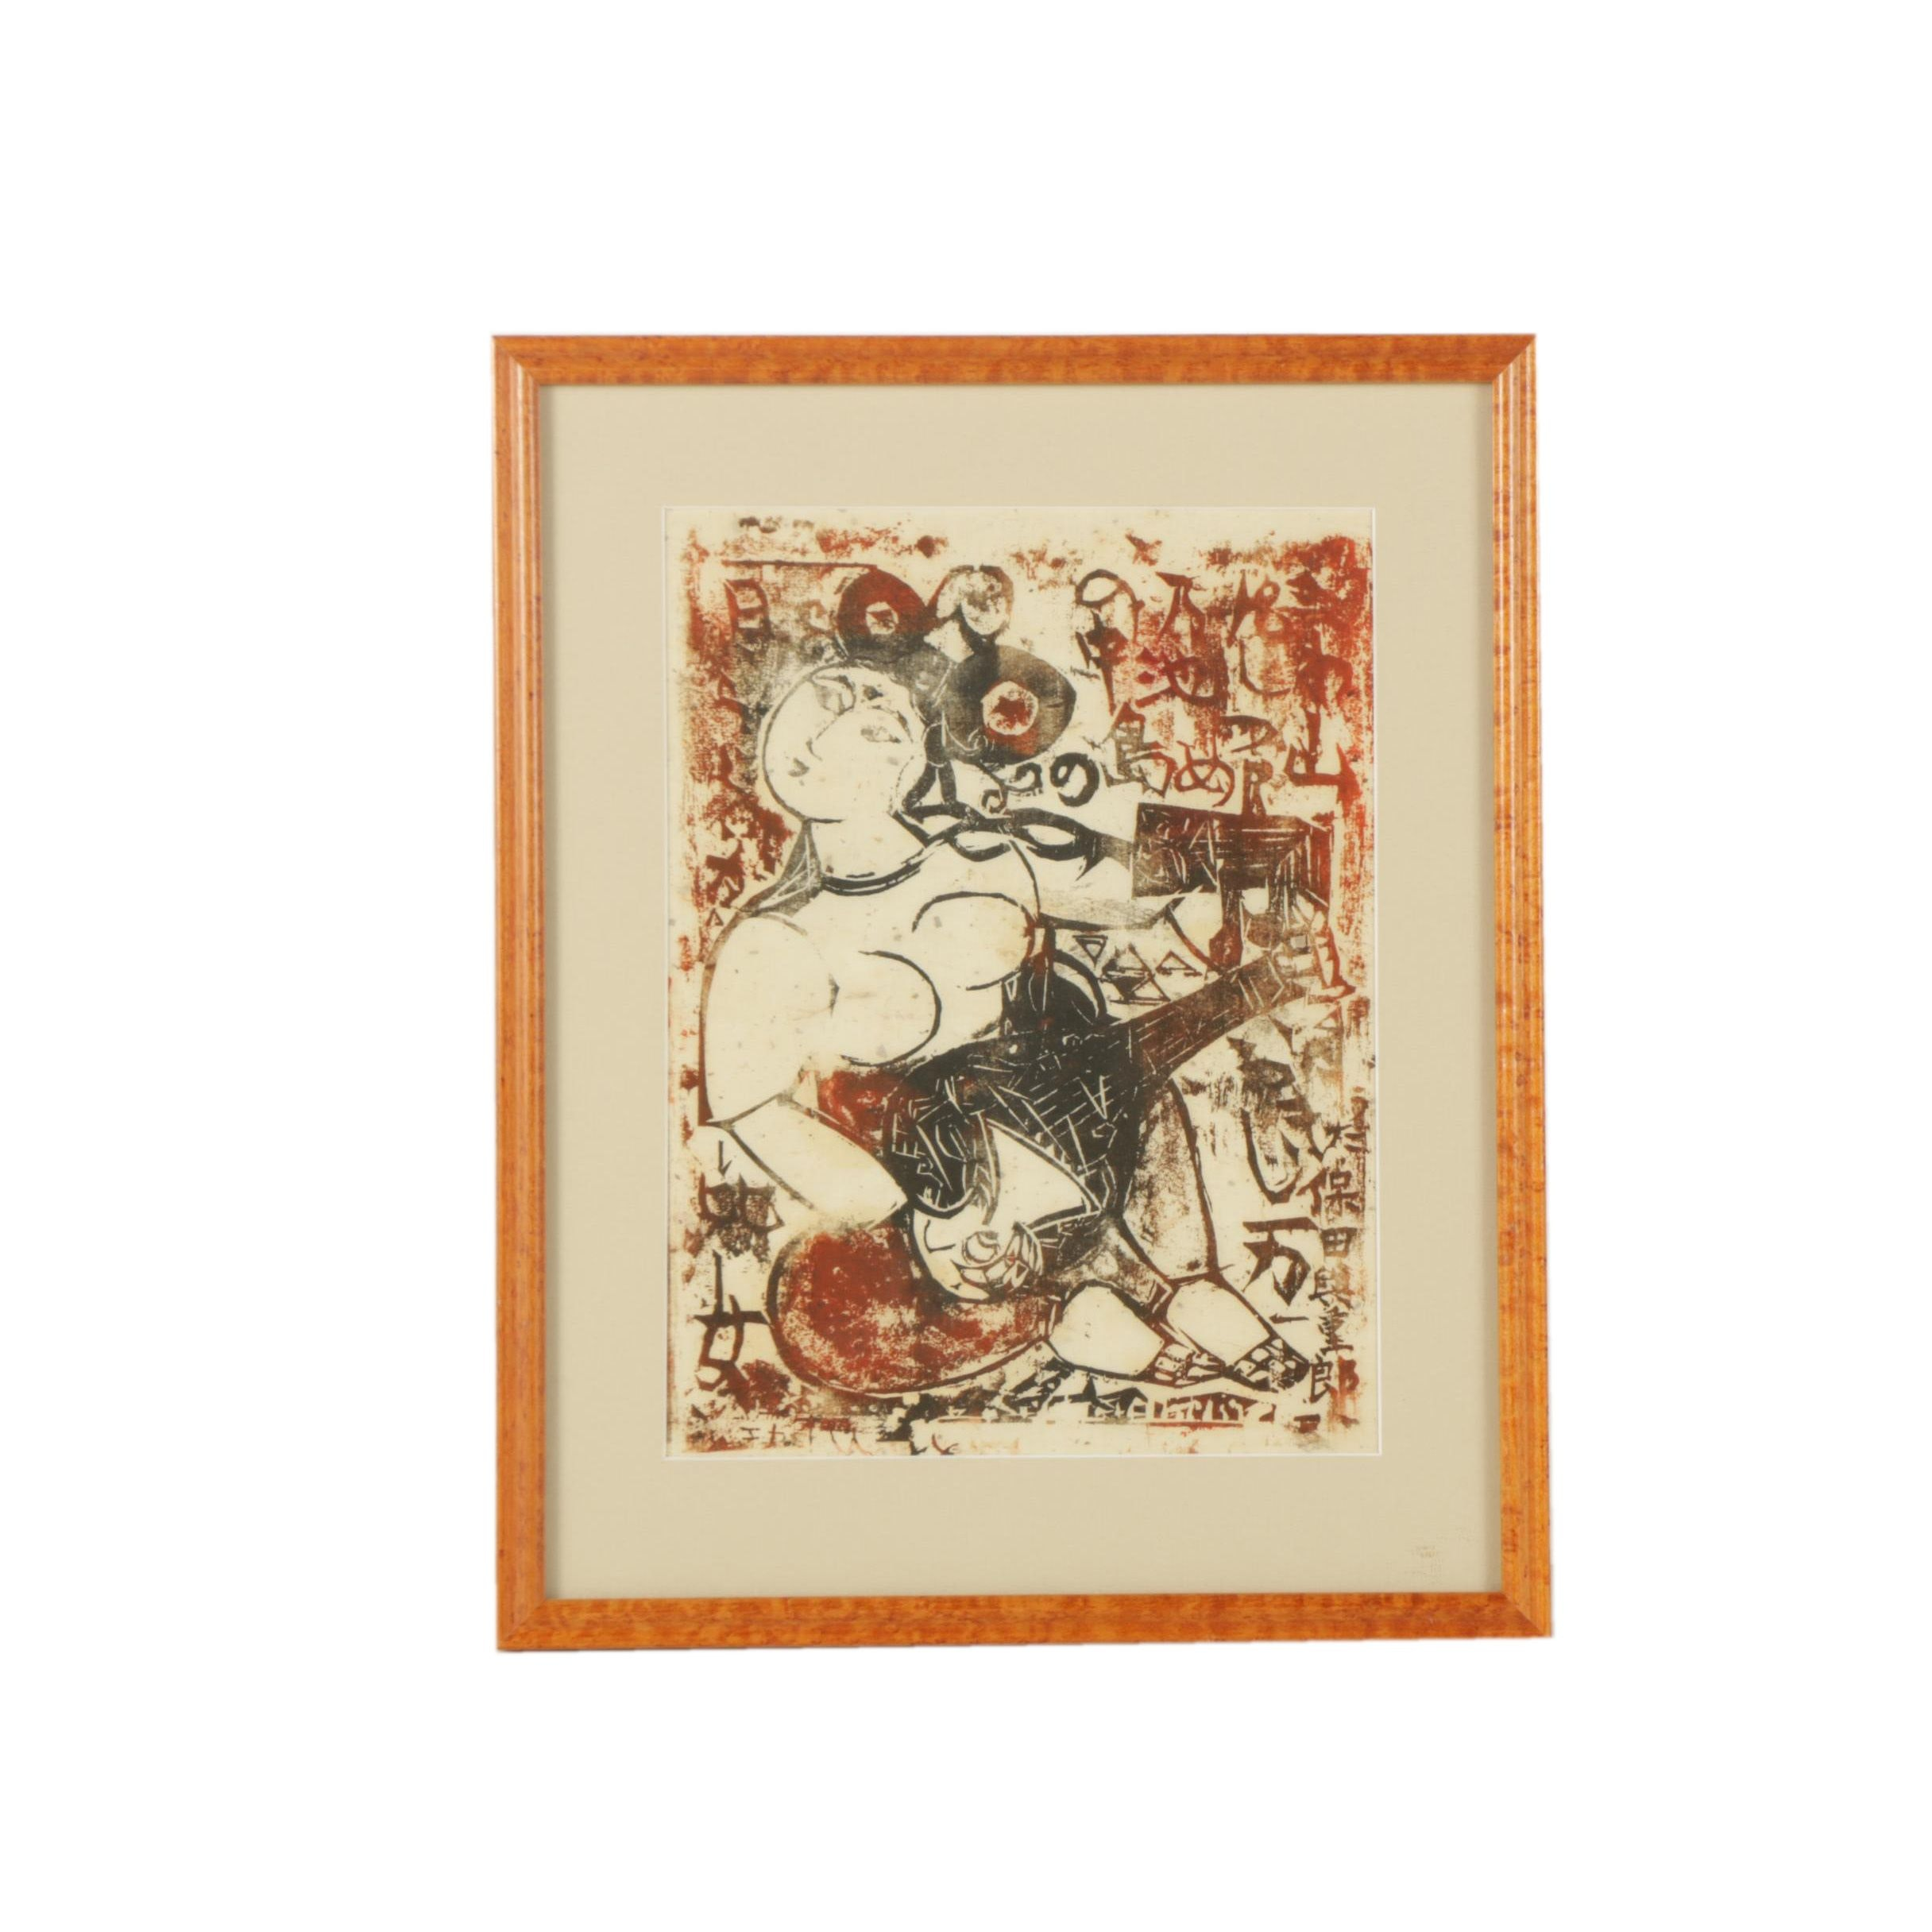 Woodblock Print in Manner of Shiko Munakata of a Woman Playing the Shamisen